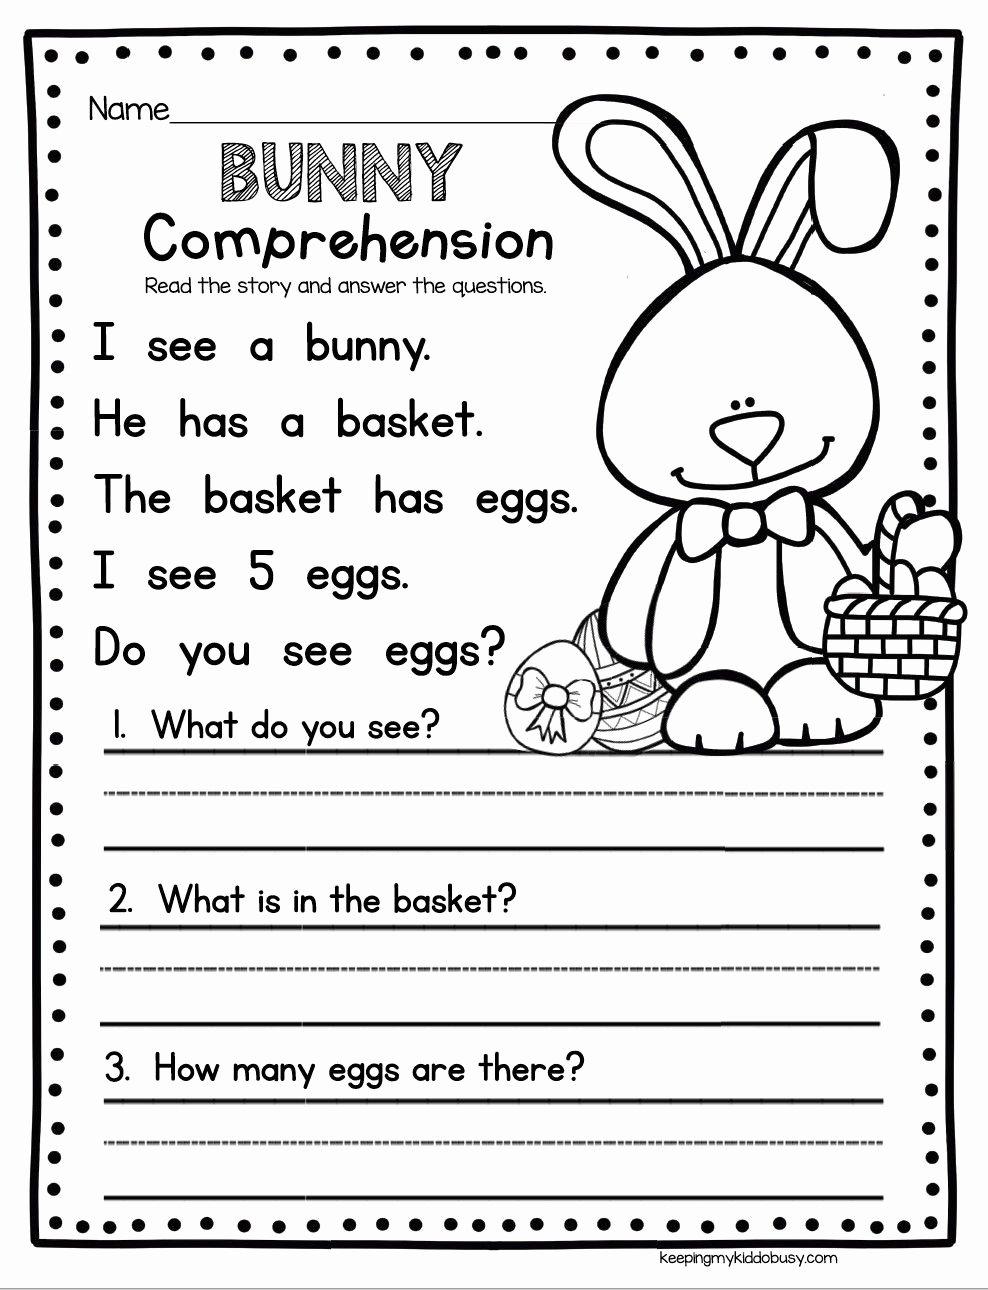 Literacy Worksheets for Preschoolers Fresh Math Worksheet Kindergarten Literacy Activities Worksheets